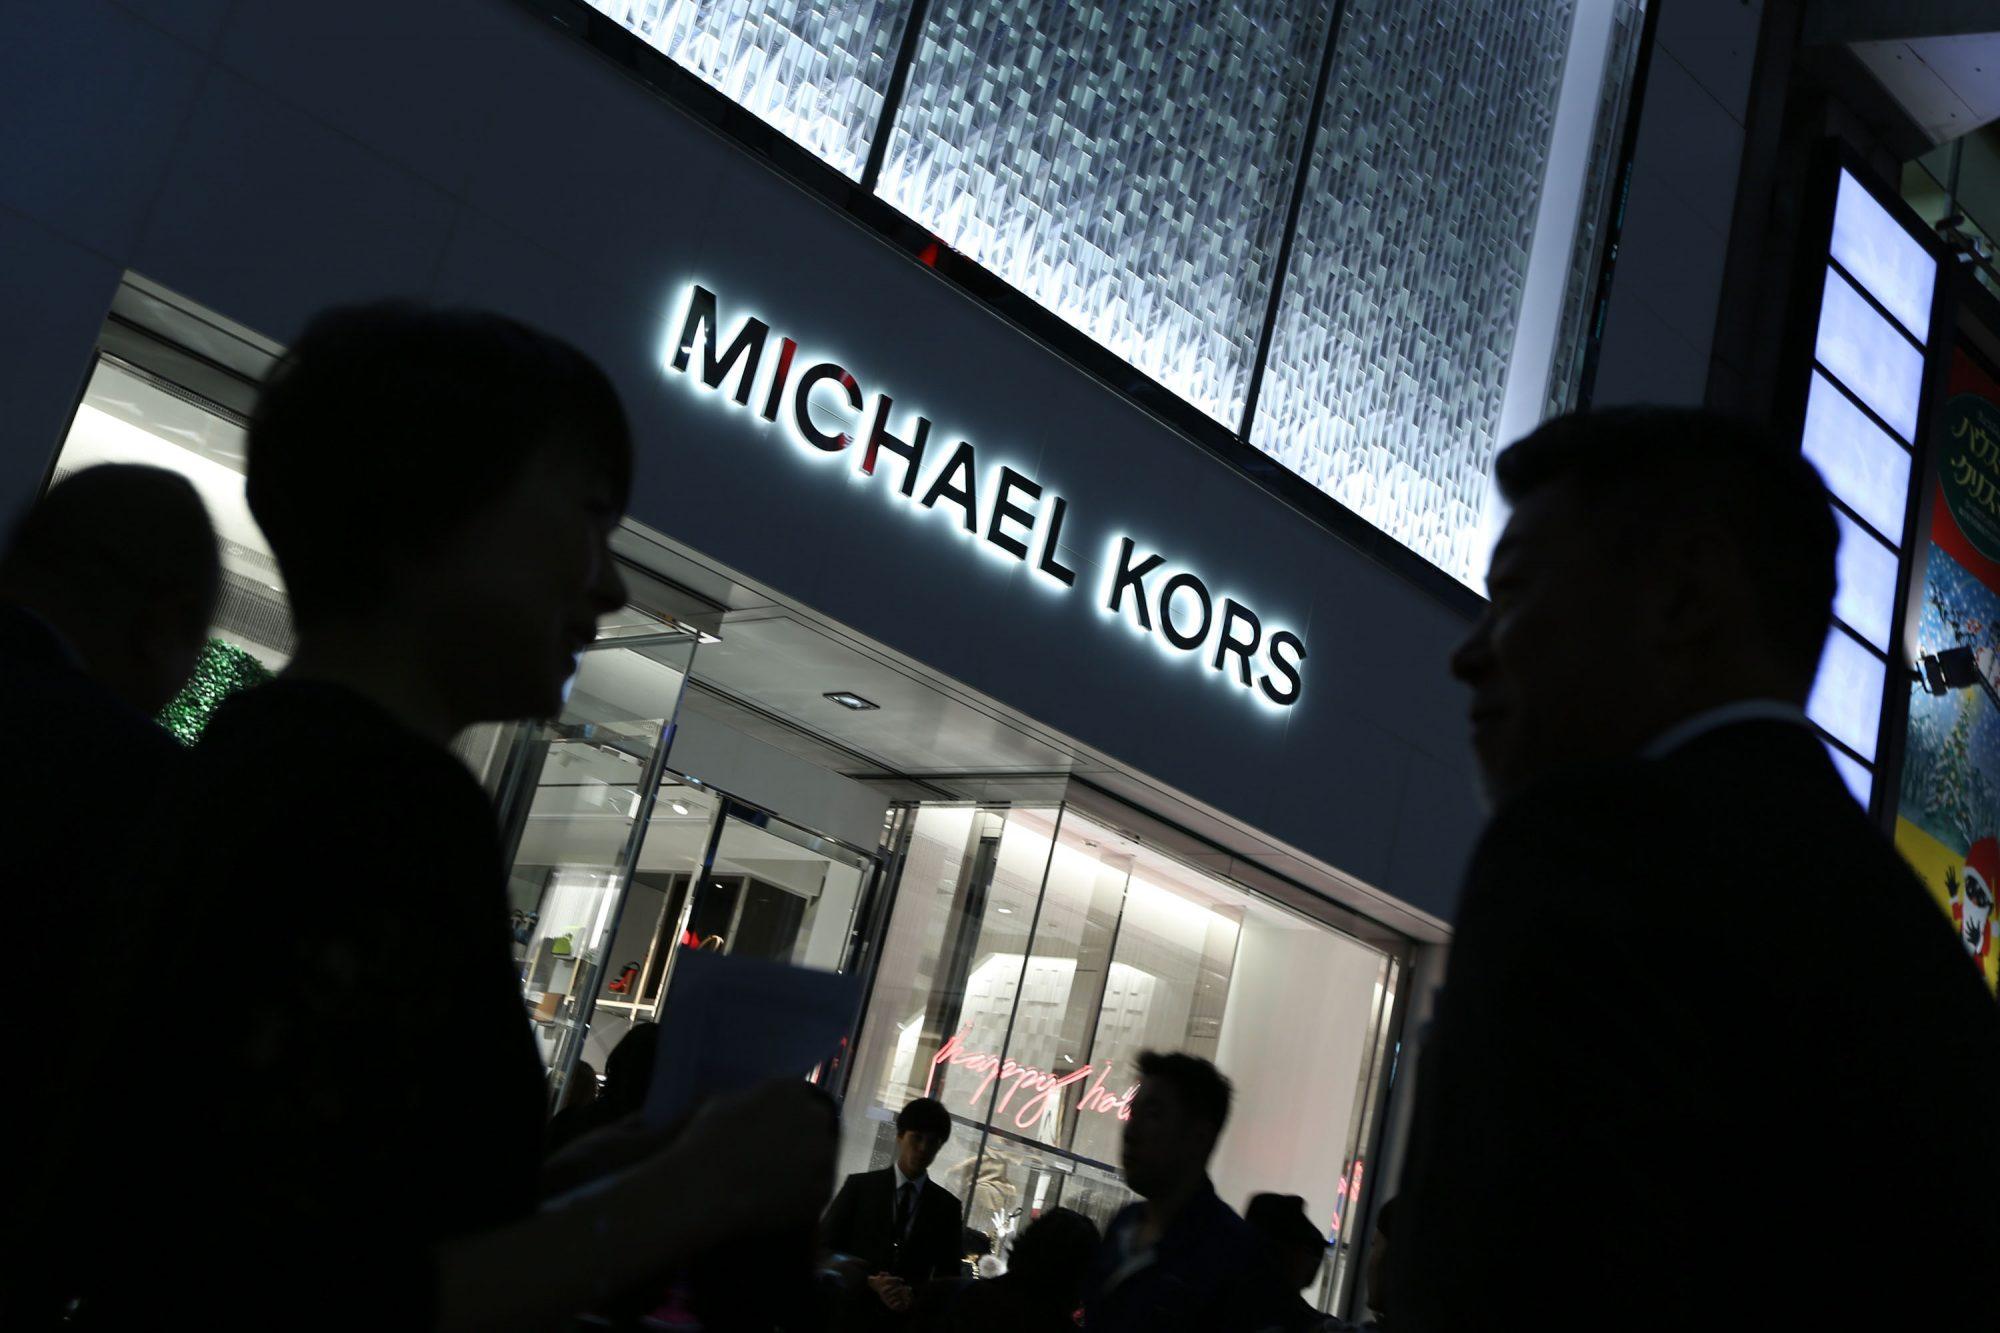 Michael Kors, Tienda, Moda, Diseñador